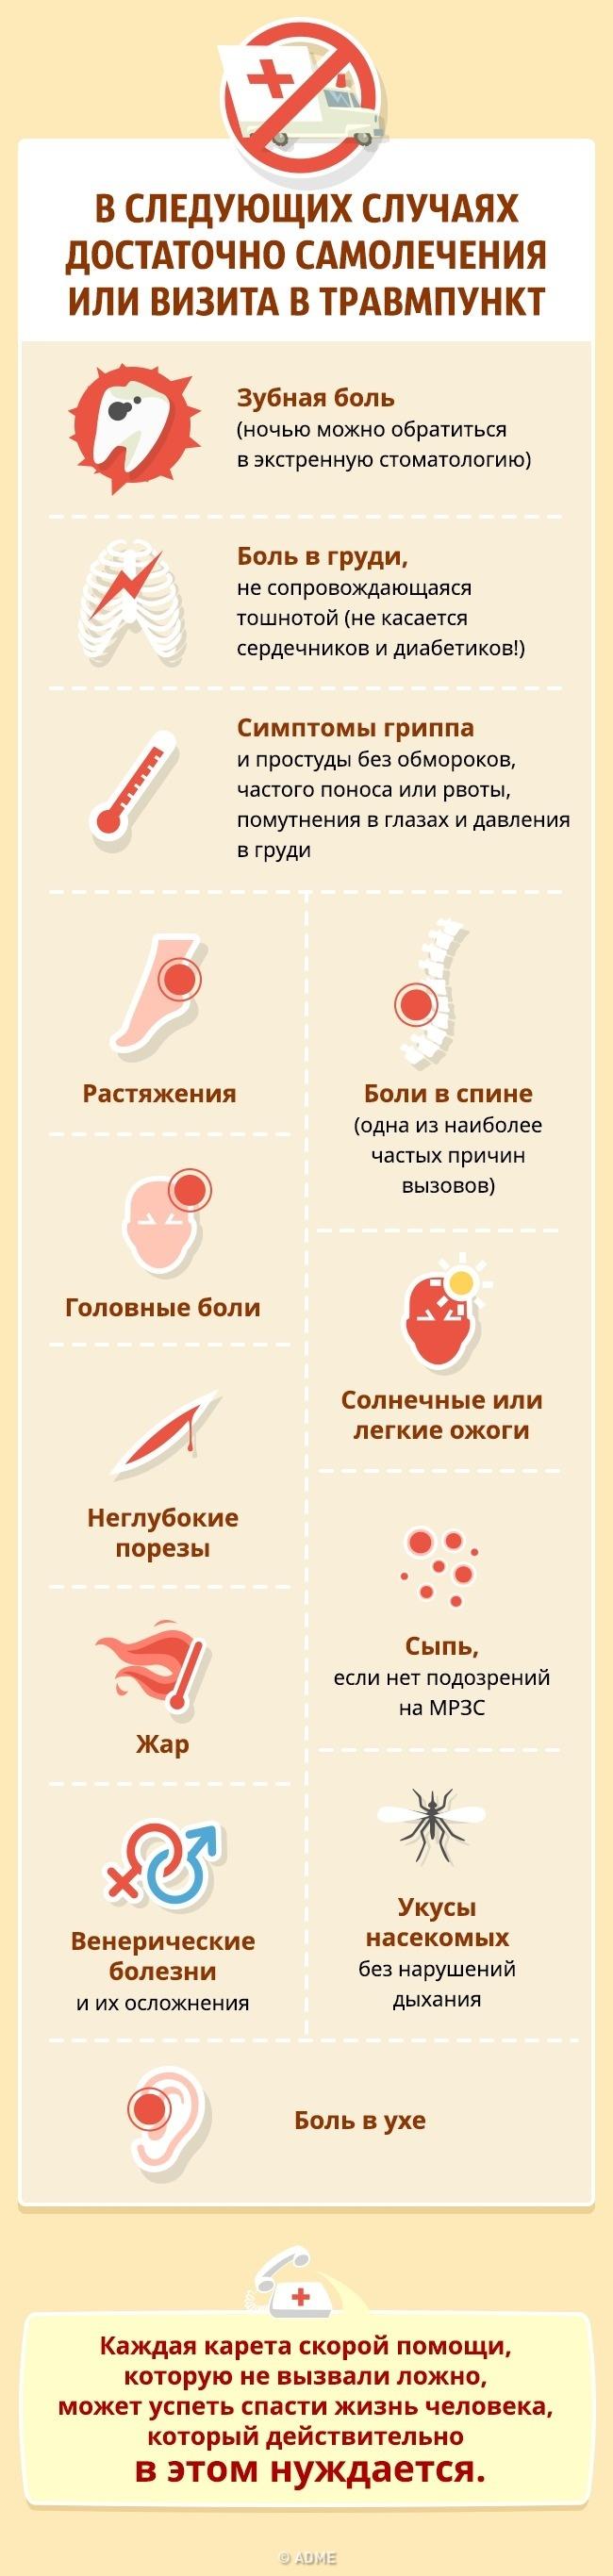 Источник scrubsmag , today , editorsweb , zdnet Перевод fotojoin.ru Иллюстратор Daniil Shubin специа